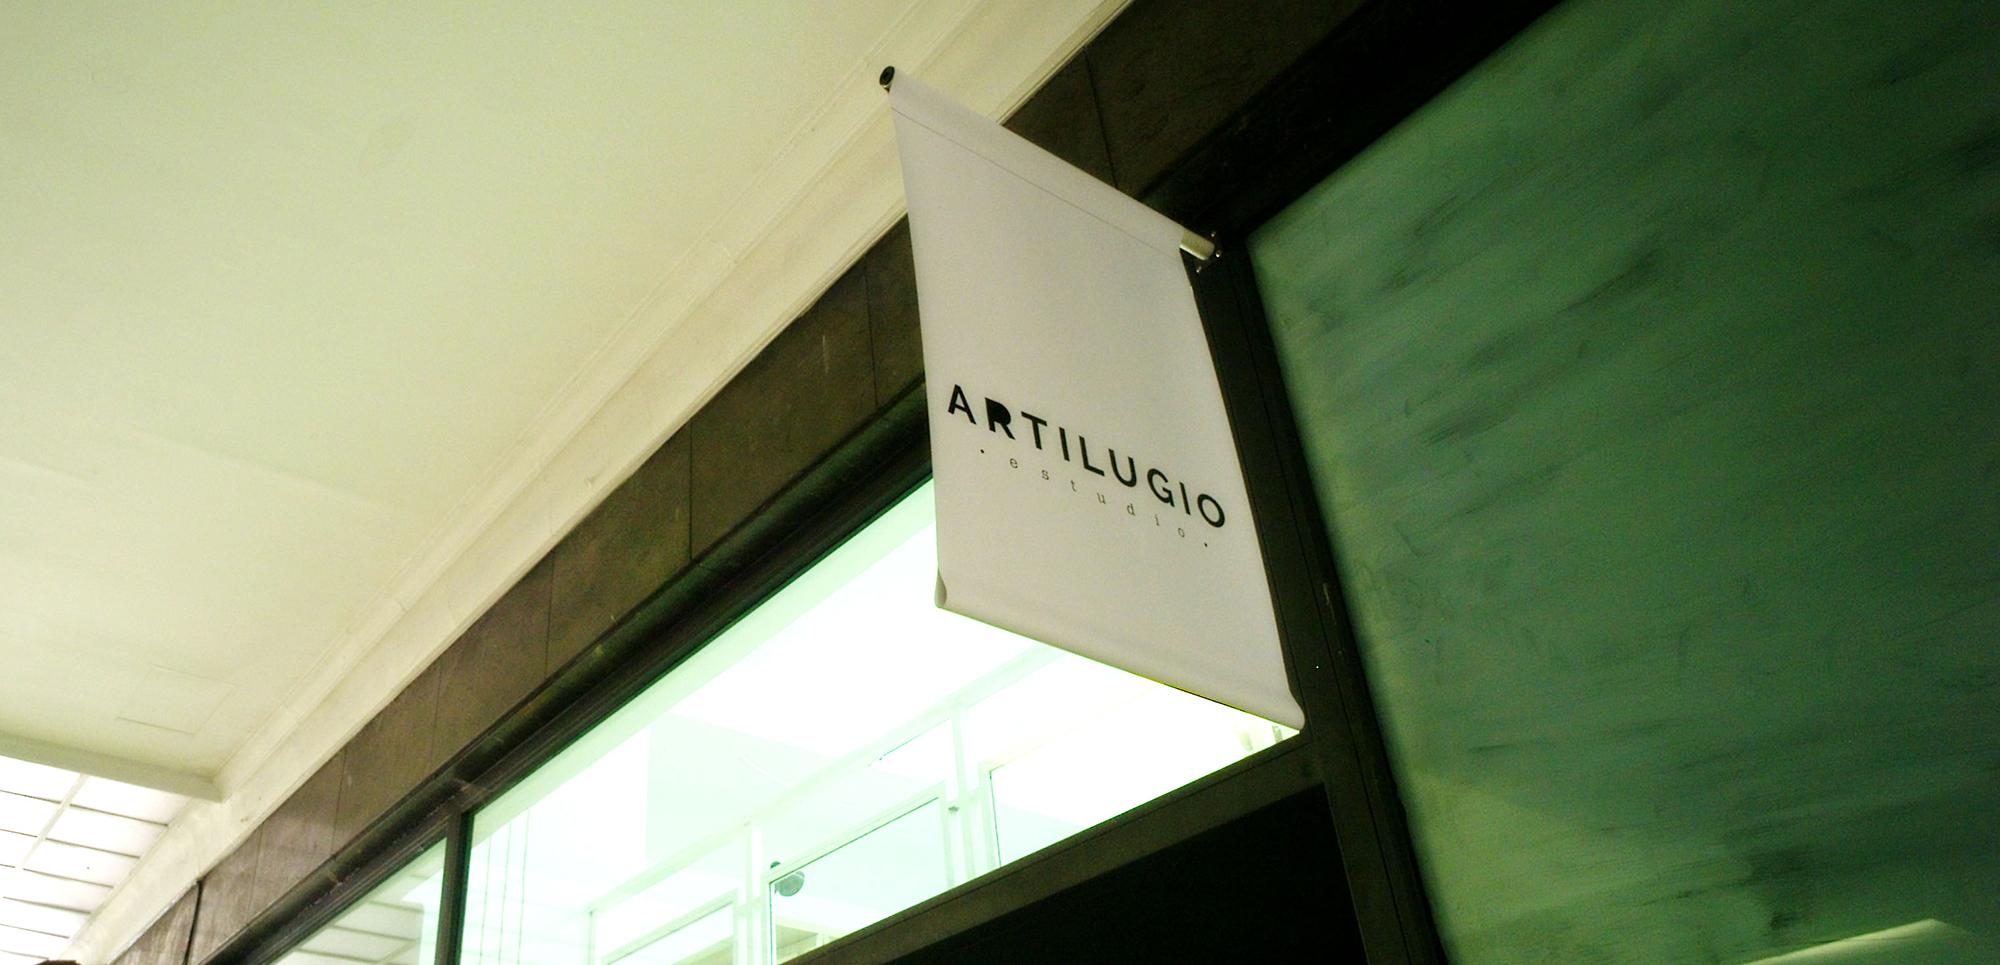 banner-artilugio-1